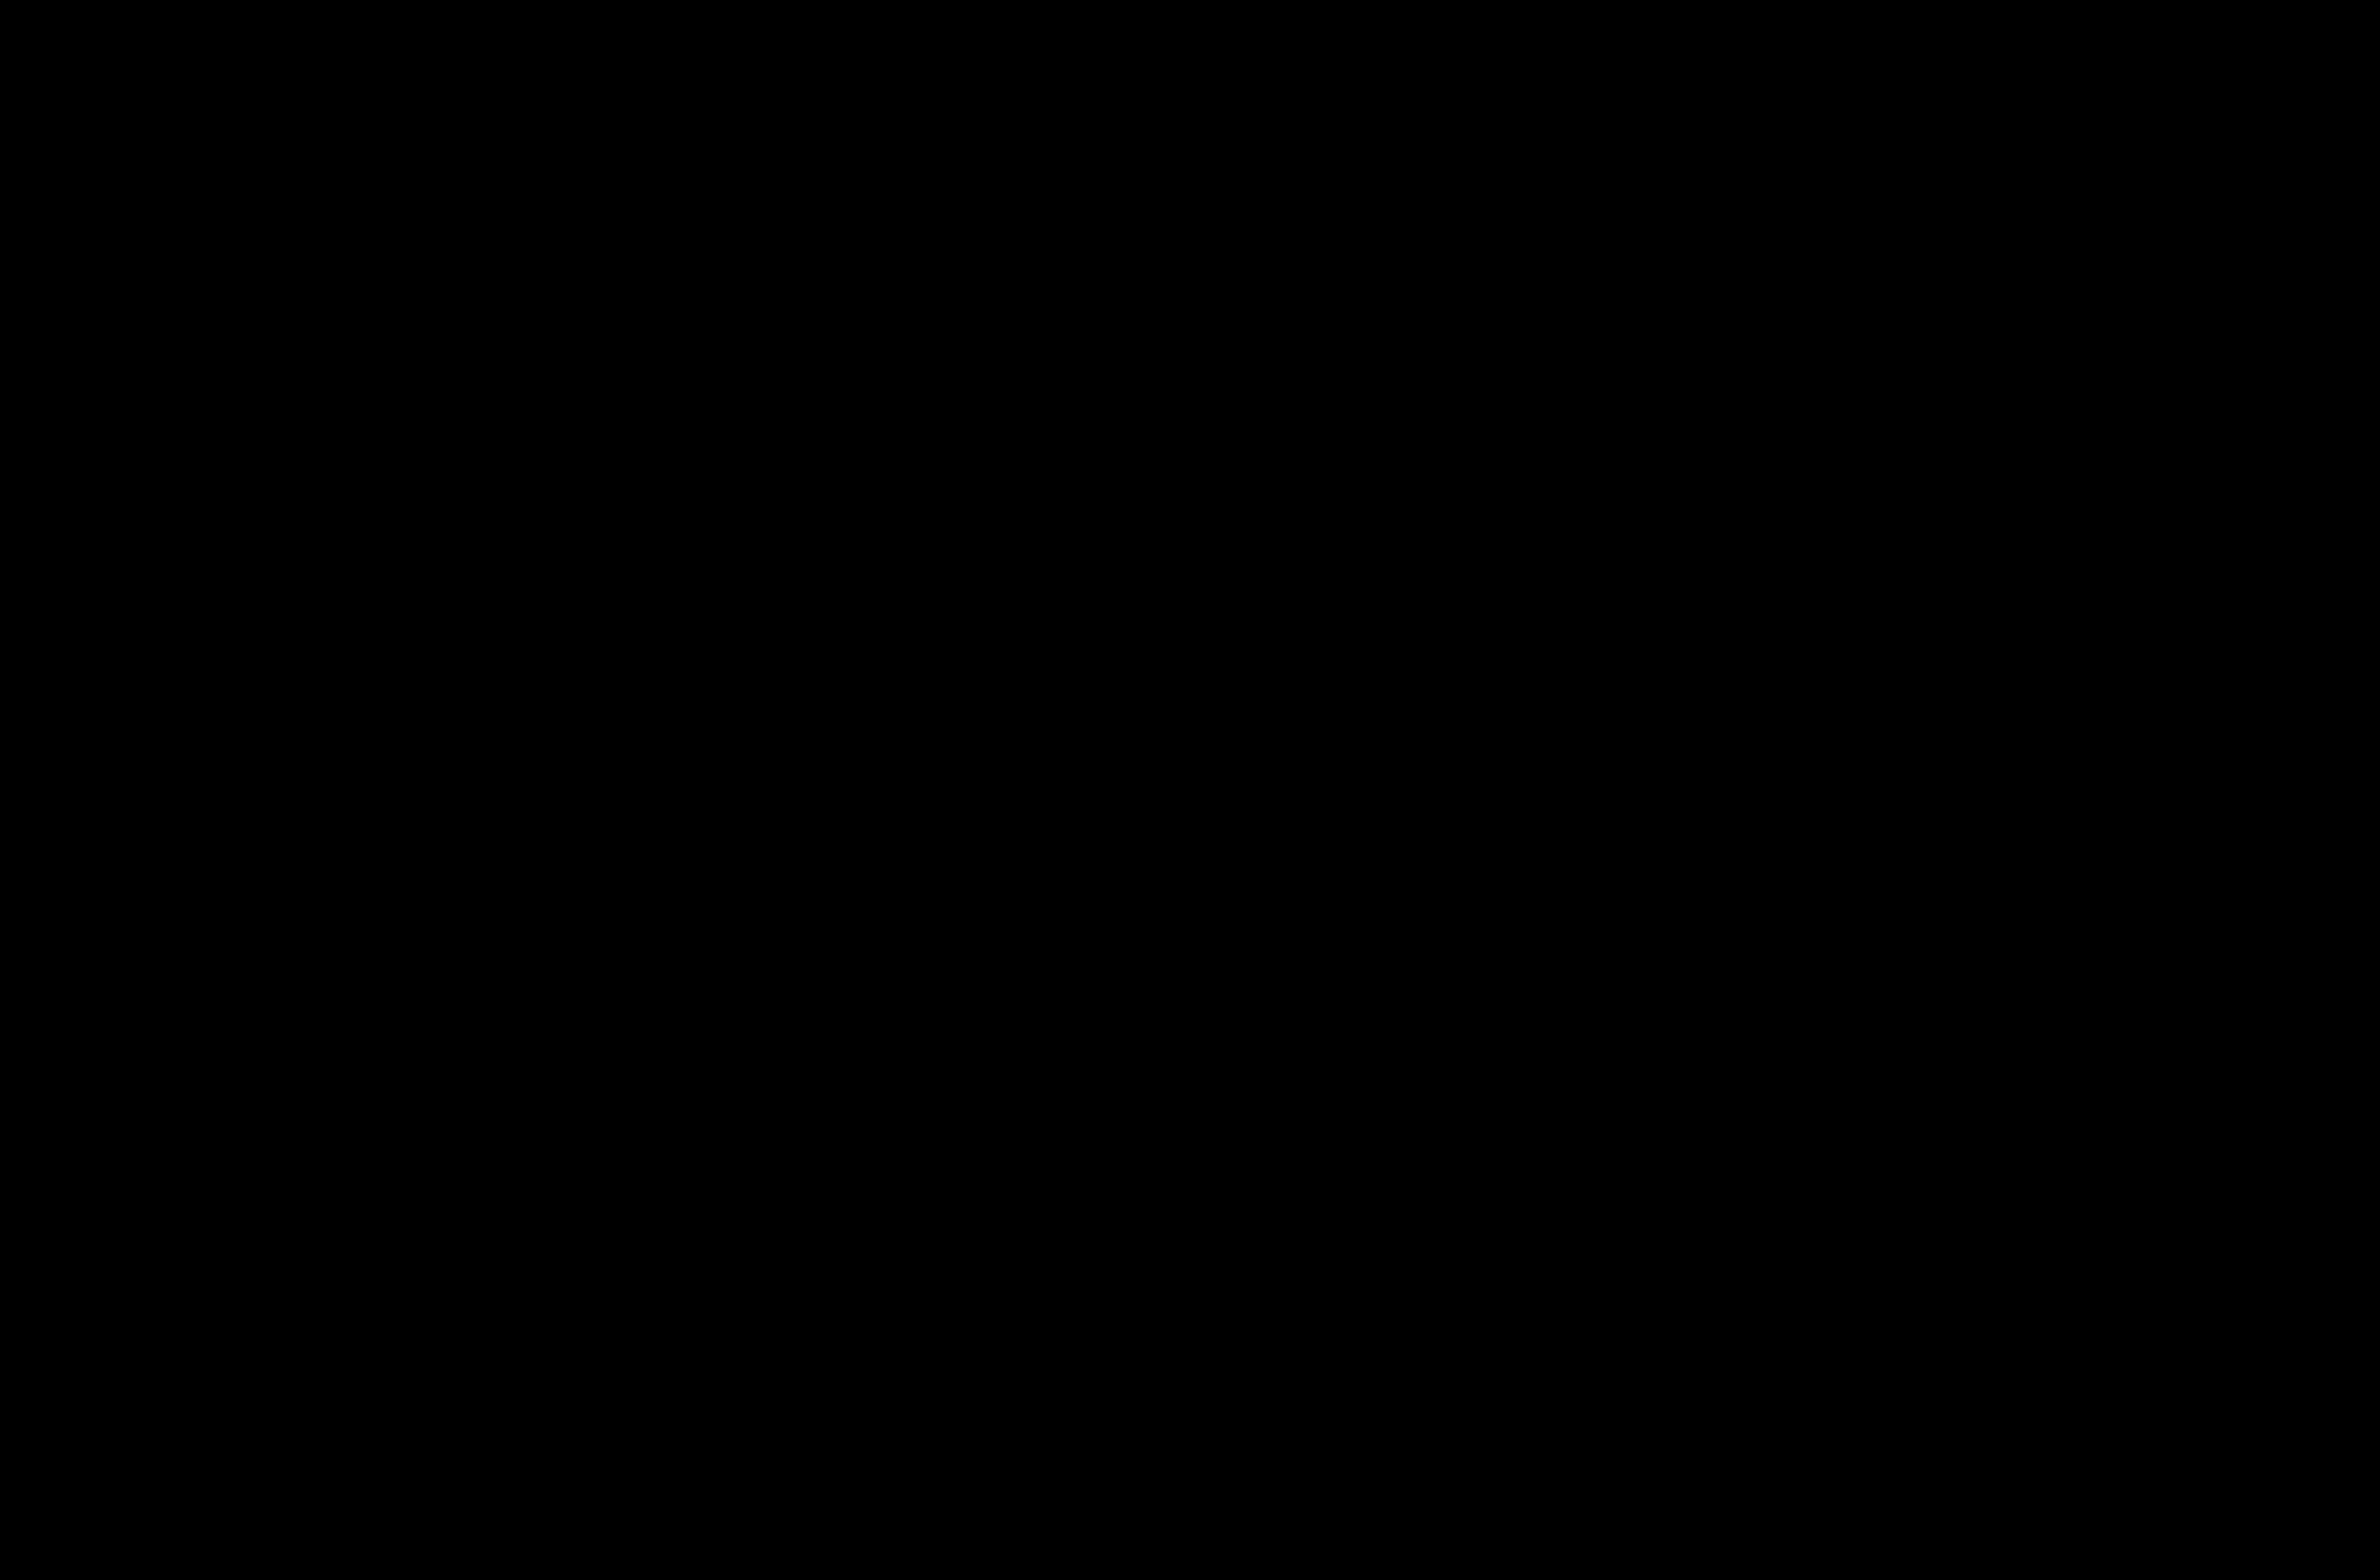 crysalis-plants-01c.png